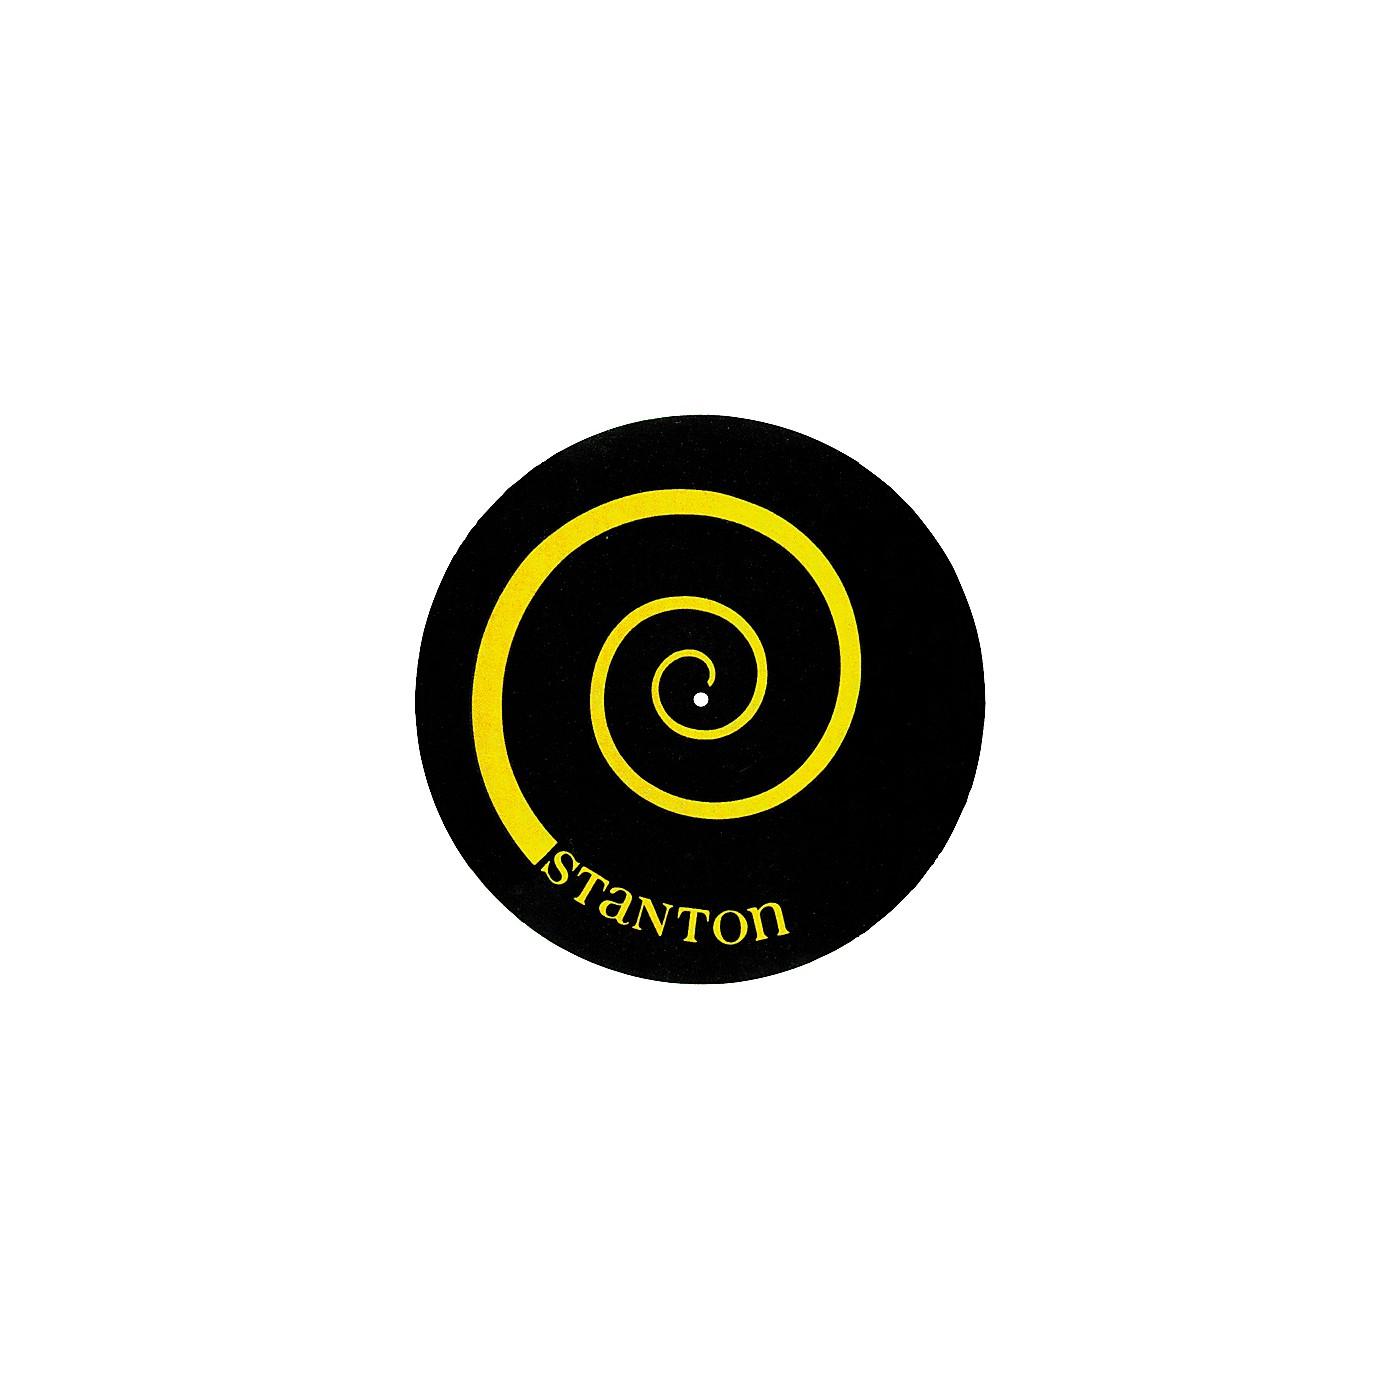 Stanton DSM-6 Yellow on Black Slipmats with Scratch Discs thumbnail